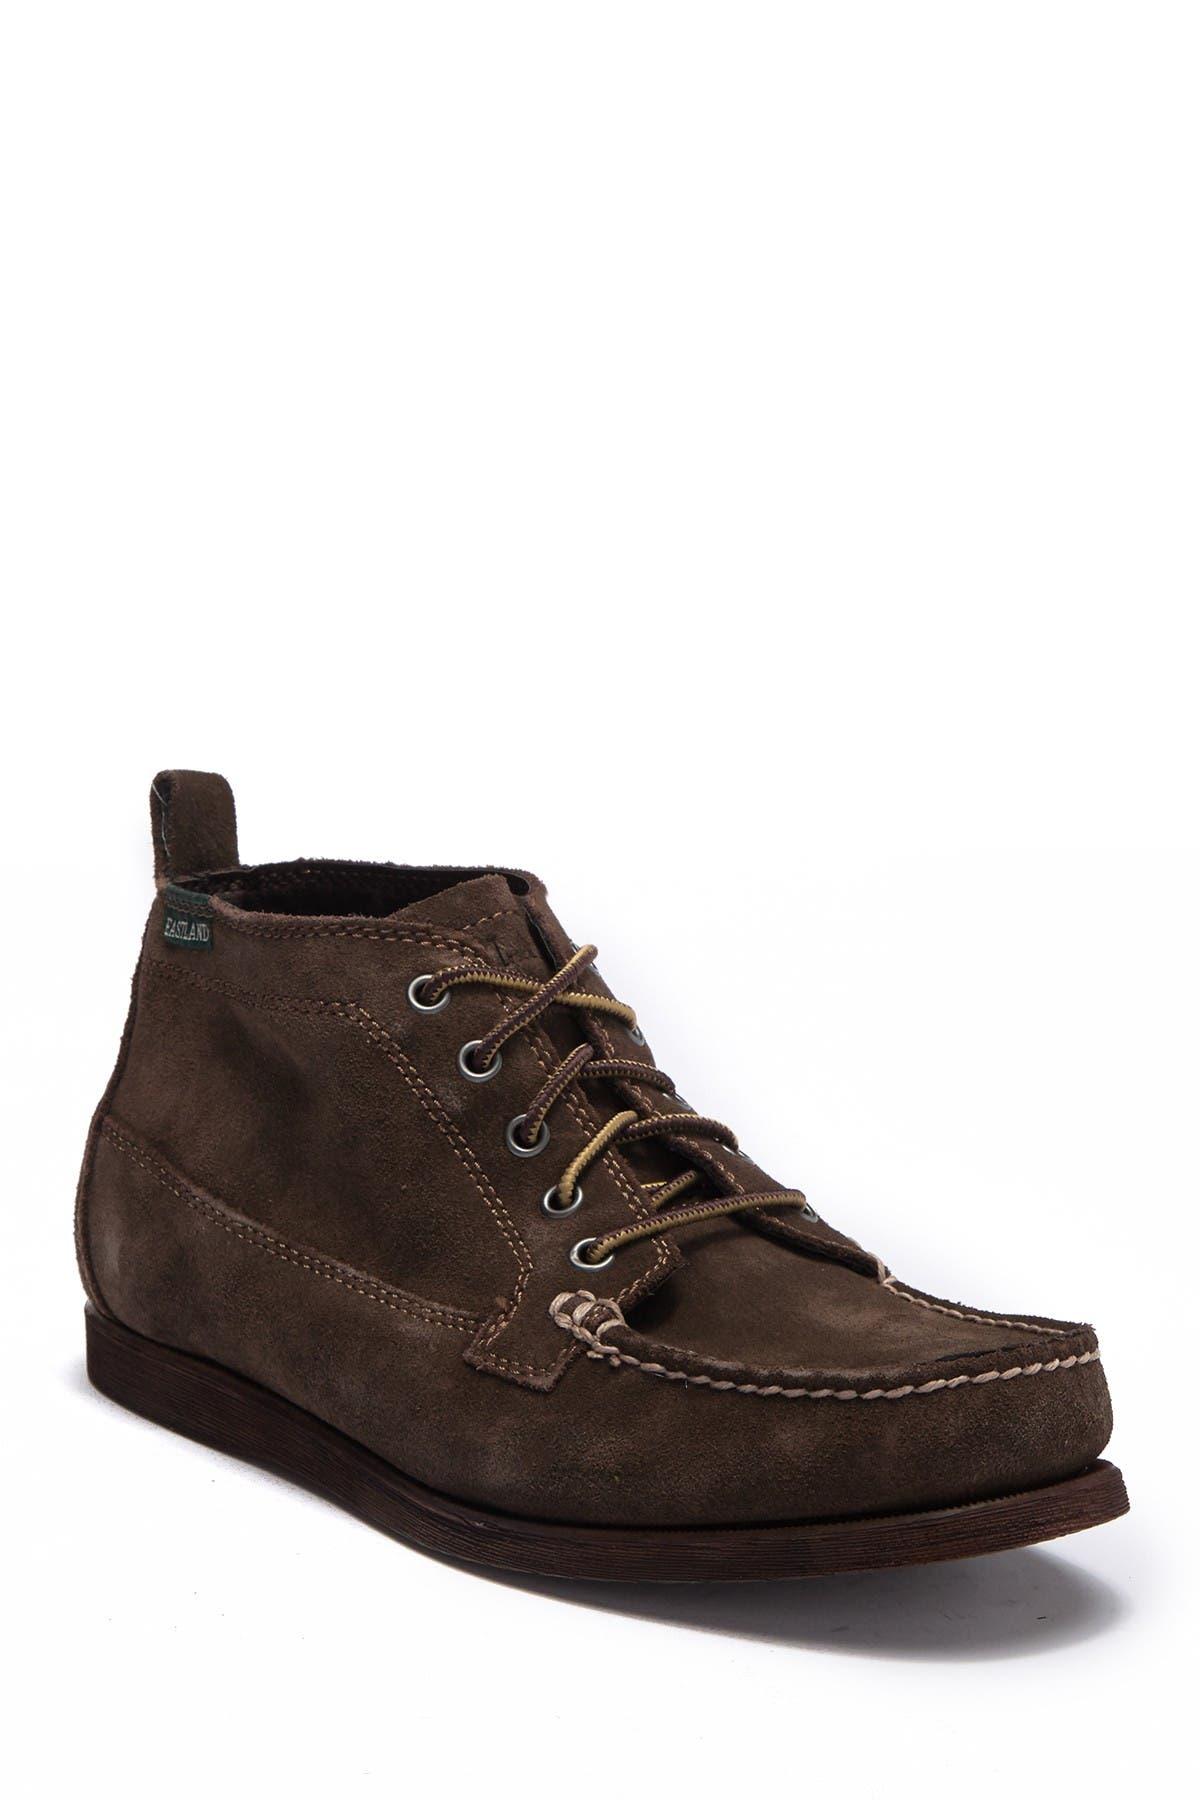 Image of Eastland Seneca Suede Boot